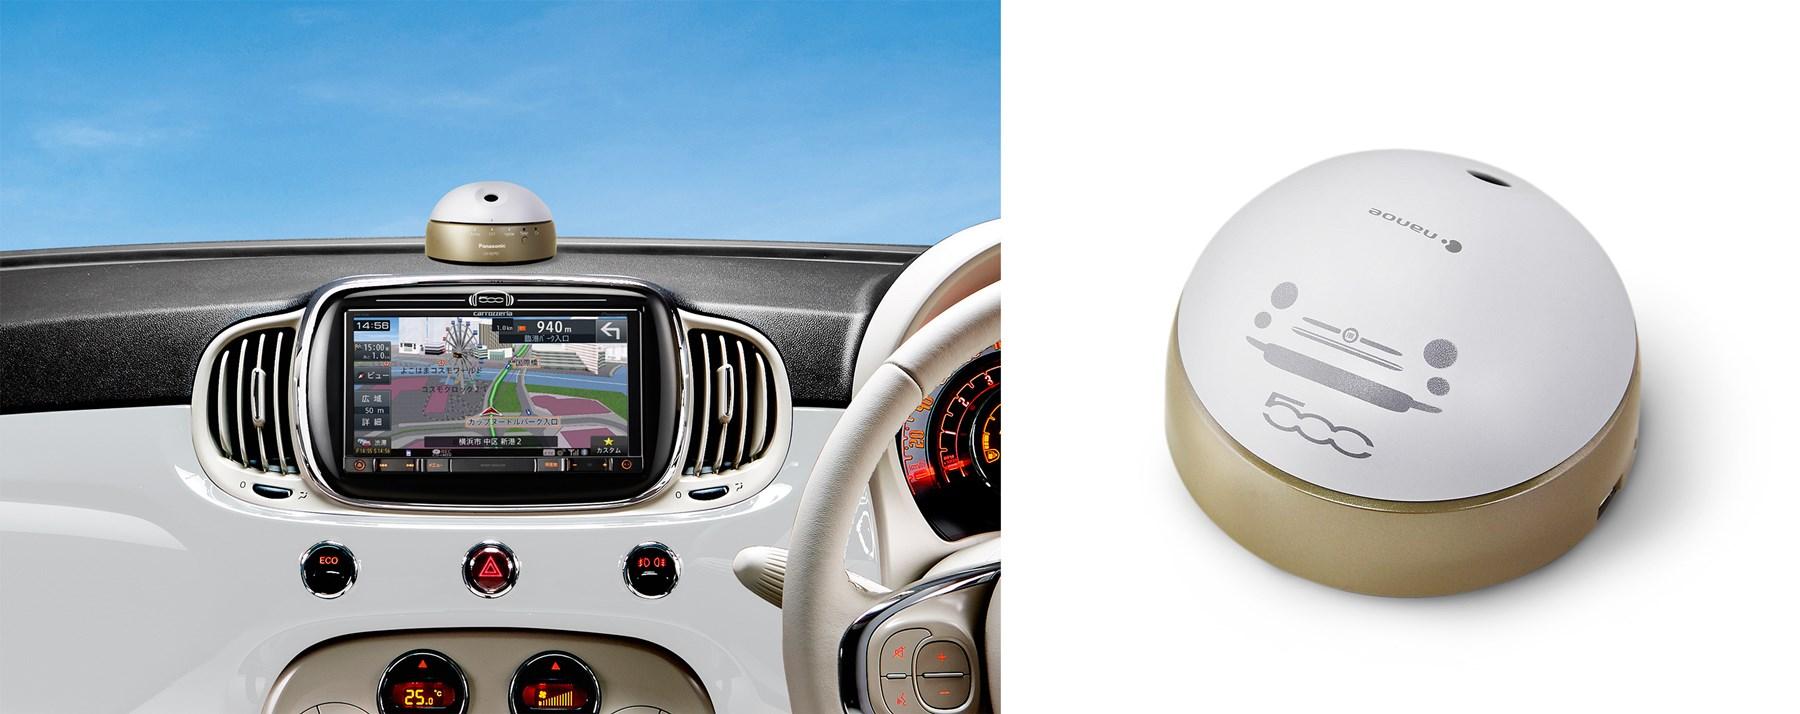 170509fiat500-Navigation-Package02